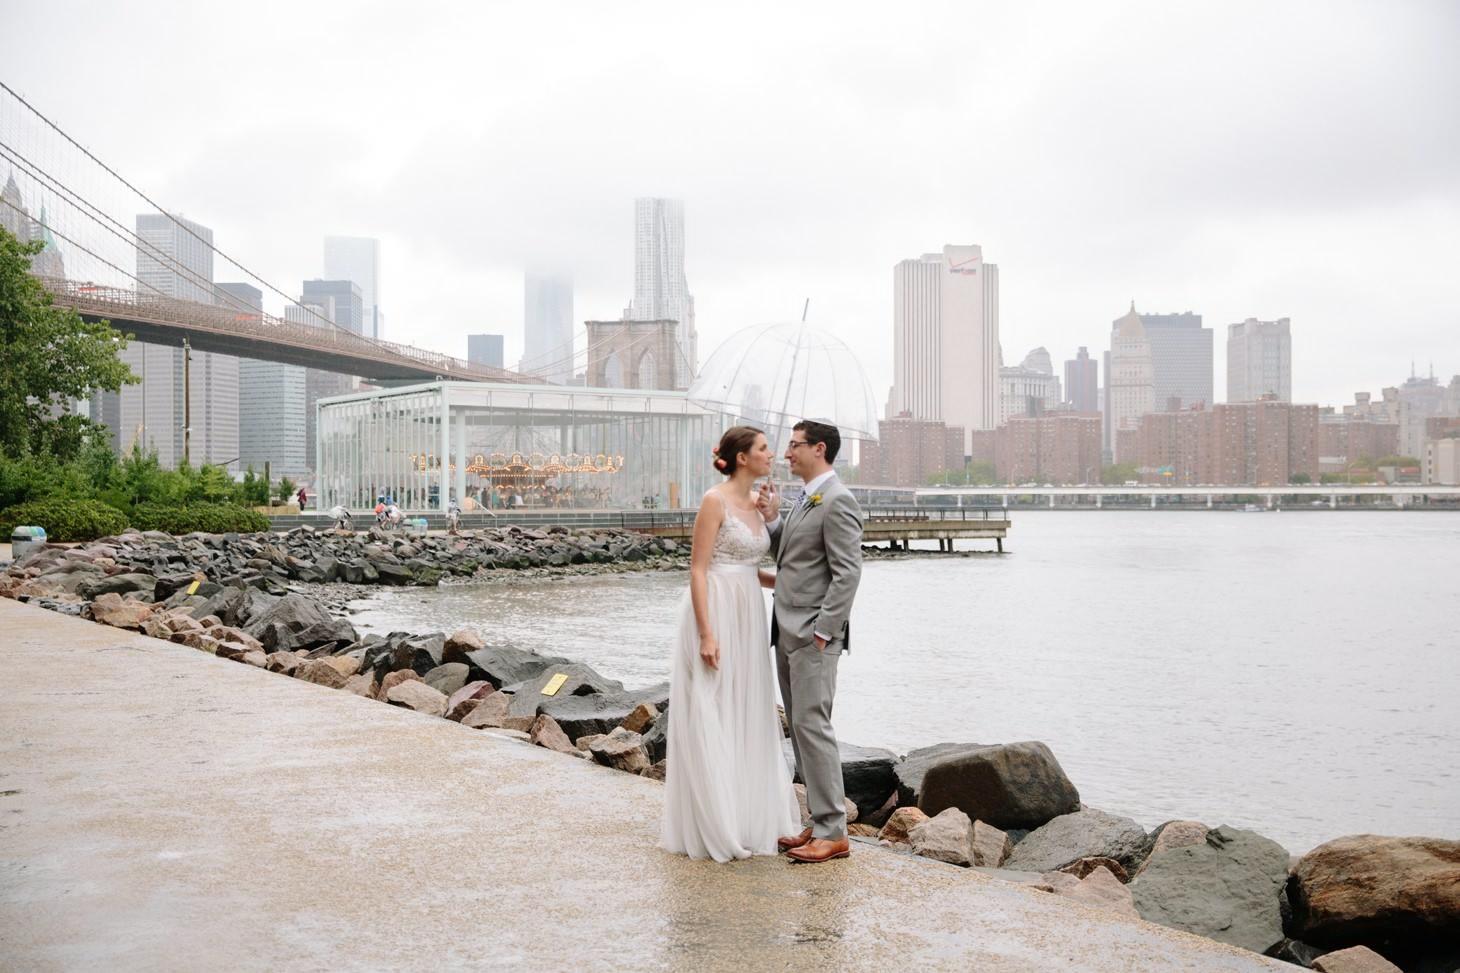 005-nyc-dumbo-loft-brooklyn-wedding-photographer-smitten-chickens-photo-.jpg